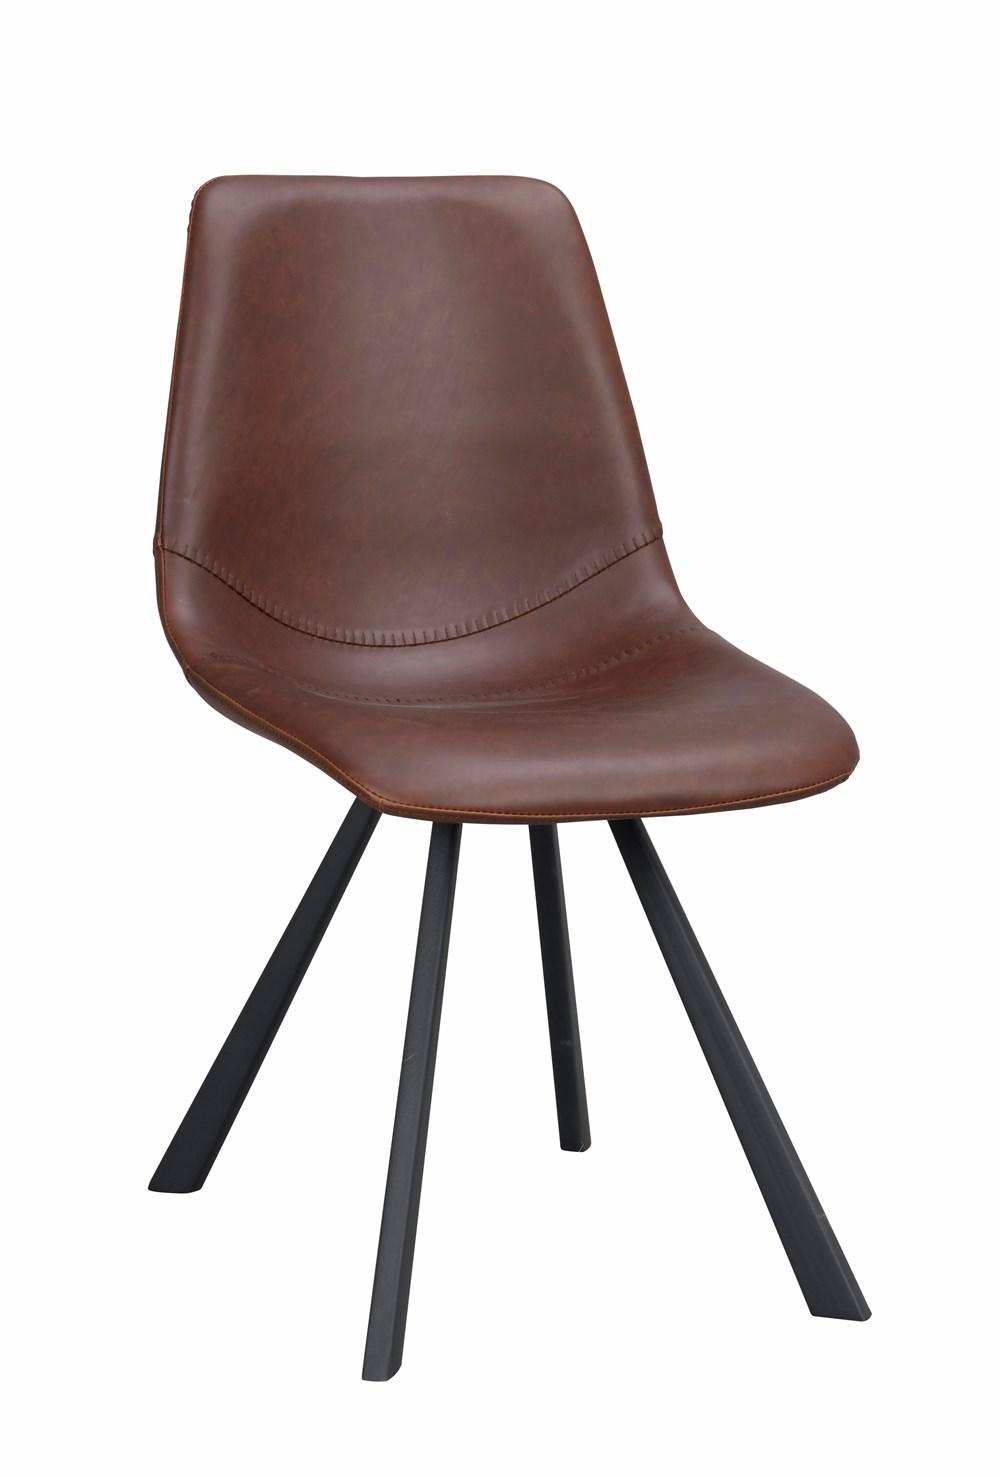 Alpha tuoli ruskea PU/musta metalli